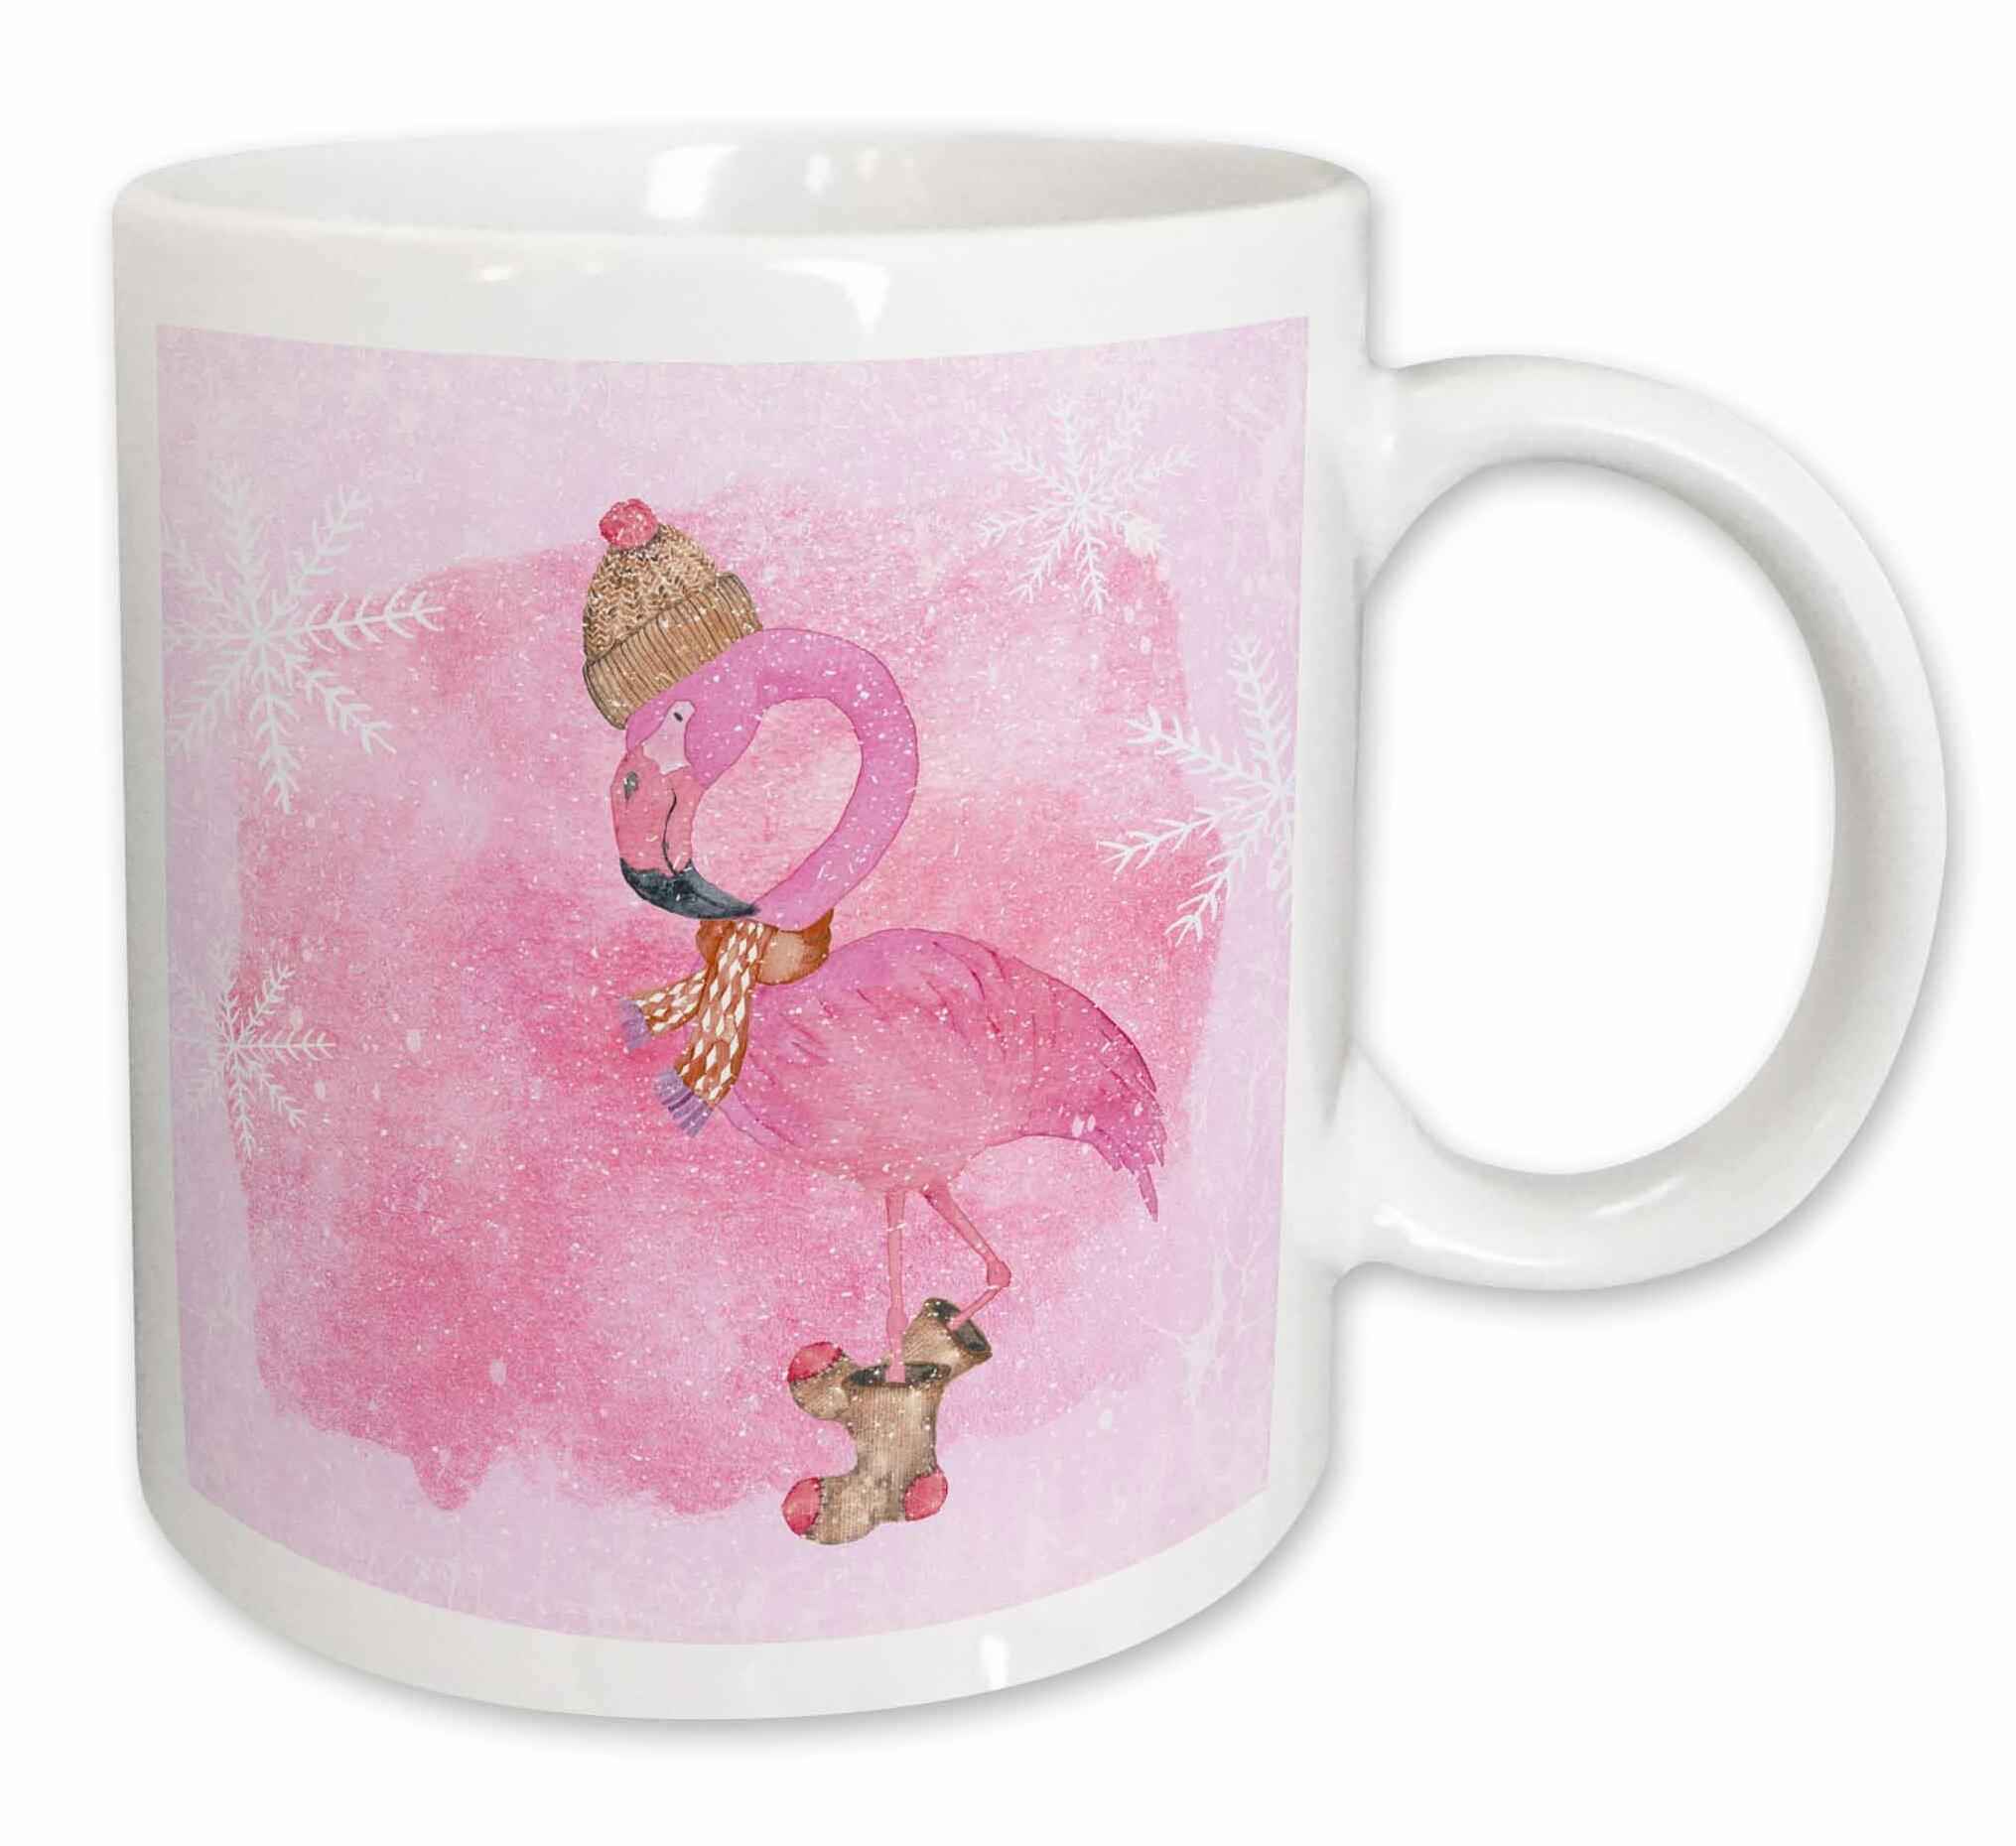 3drose Merry Christmas Coffee Mug Wayfair